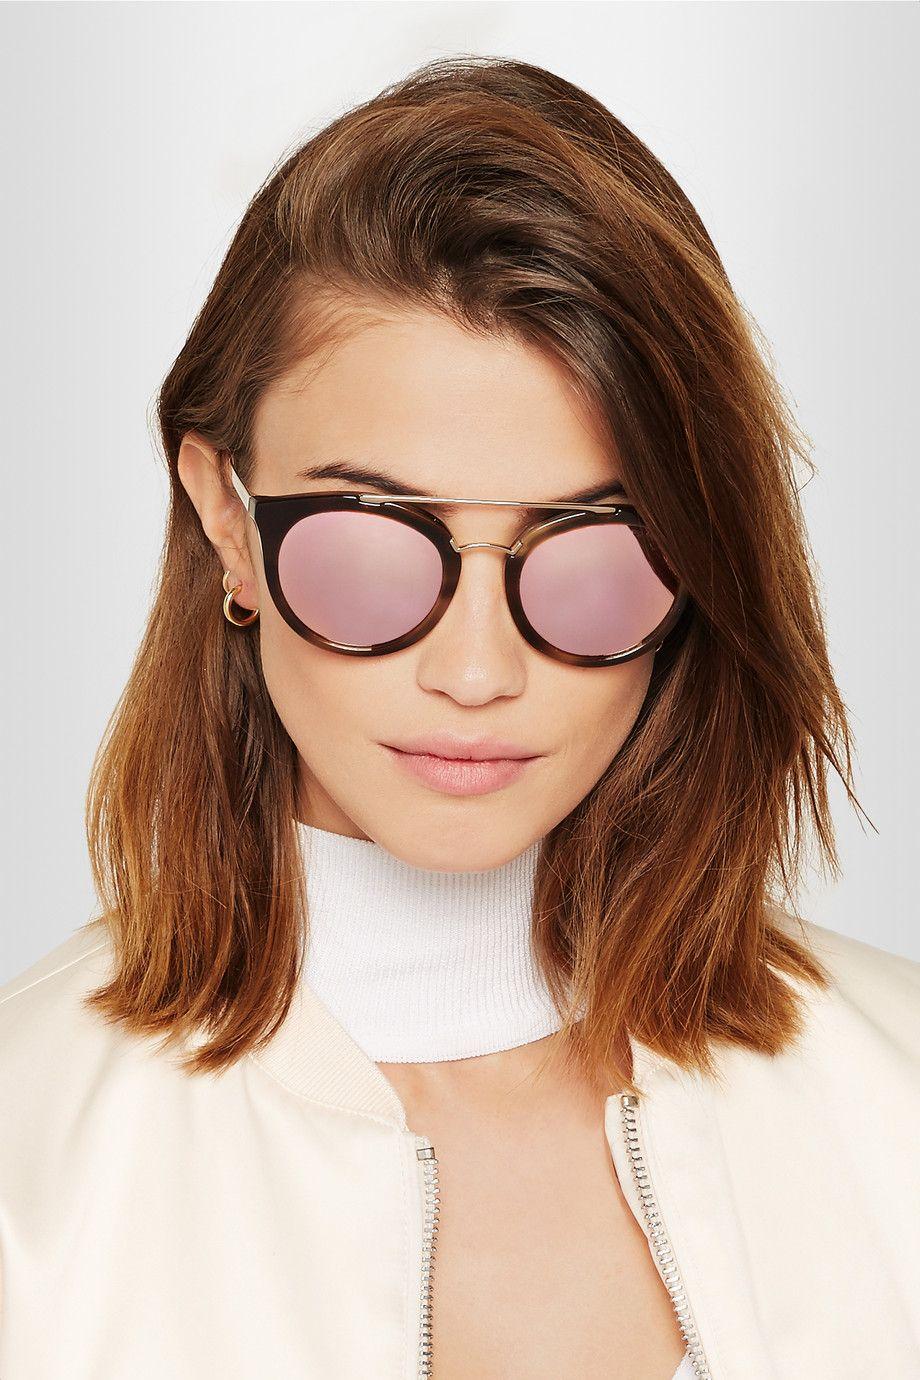 fed9beb8f0e ... switzerland prada cat eye acetate and gold tone mirrored sunglasses net  a porter bc1f1 4fd9e ...